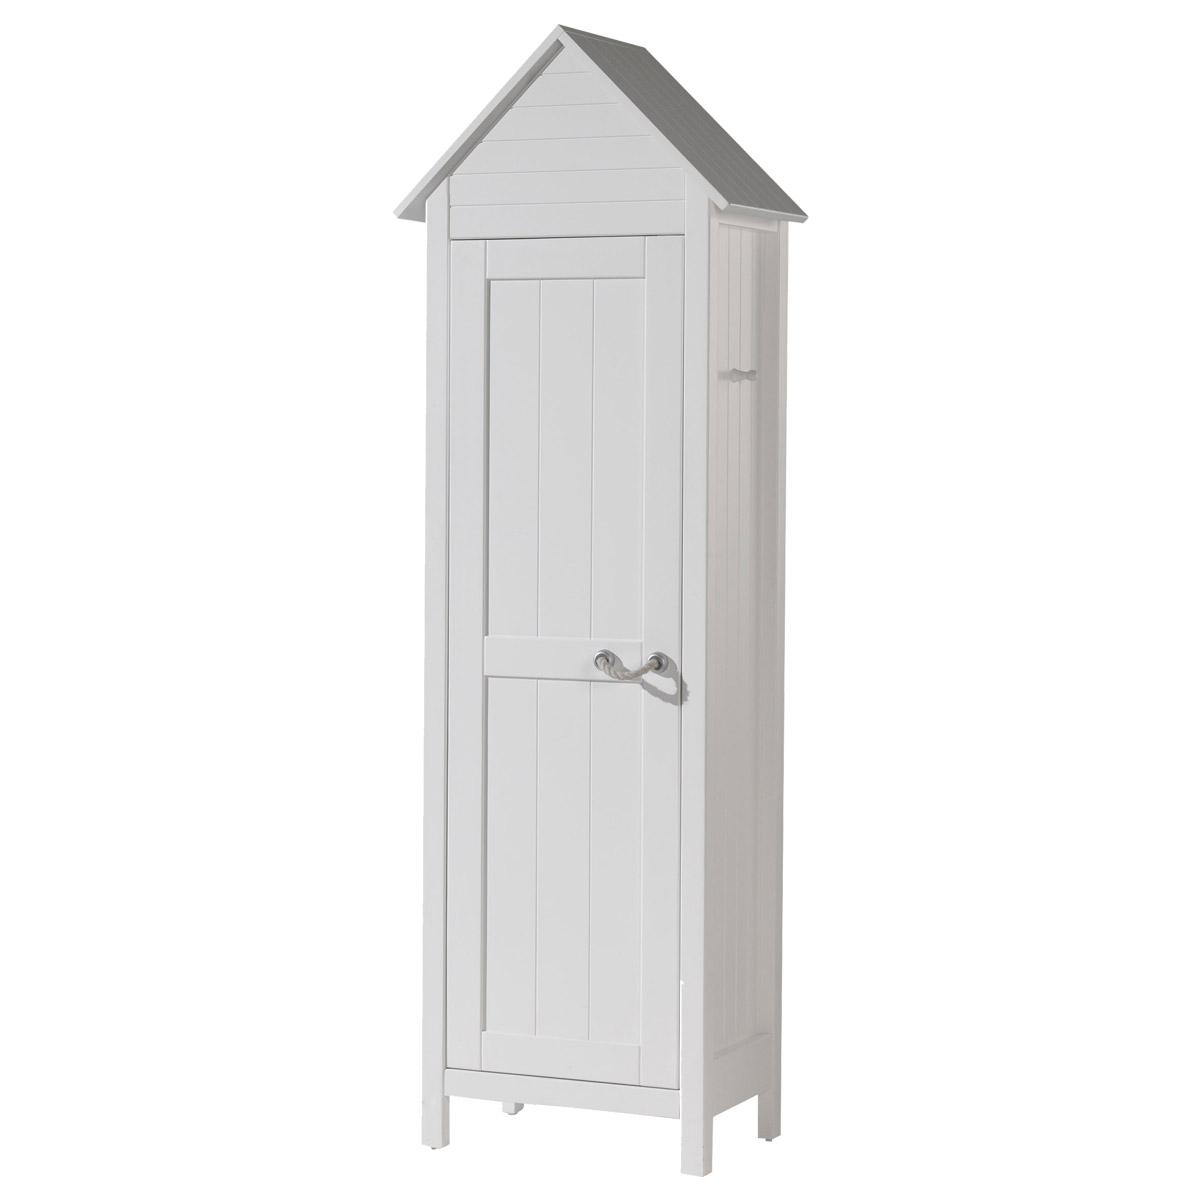 Vipack - Armoire 1 porte BeachHouse Lewis - Blanc